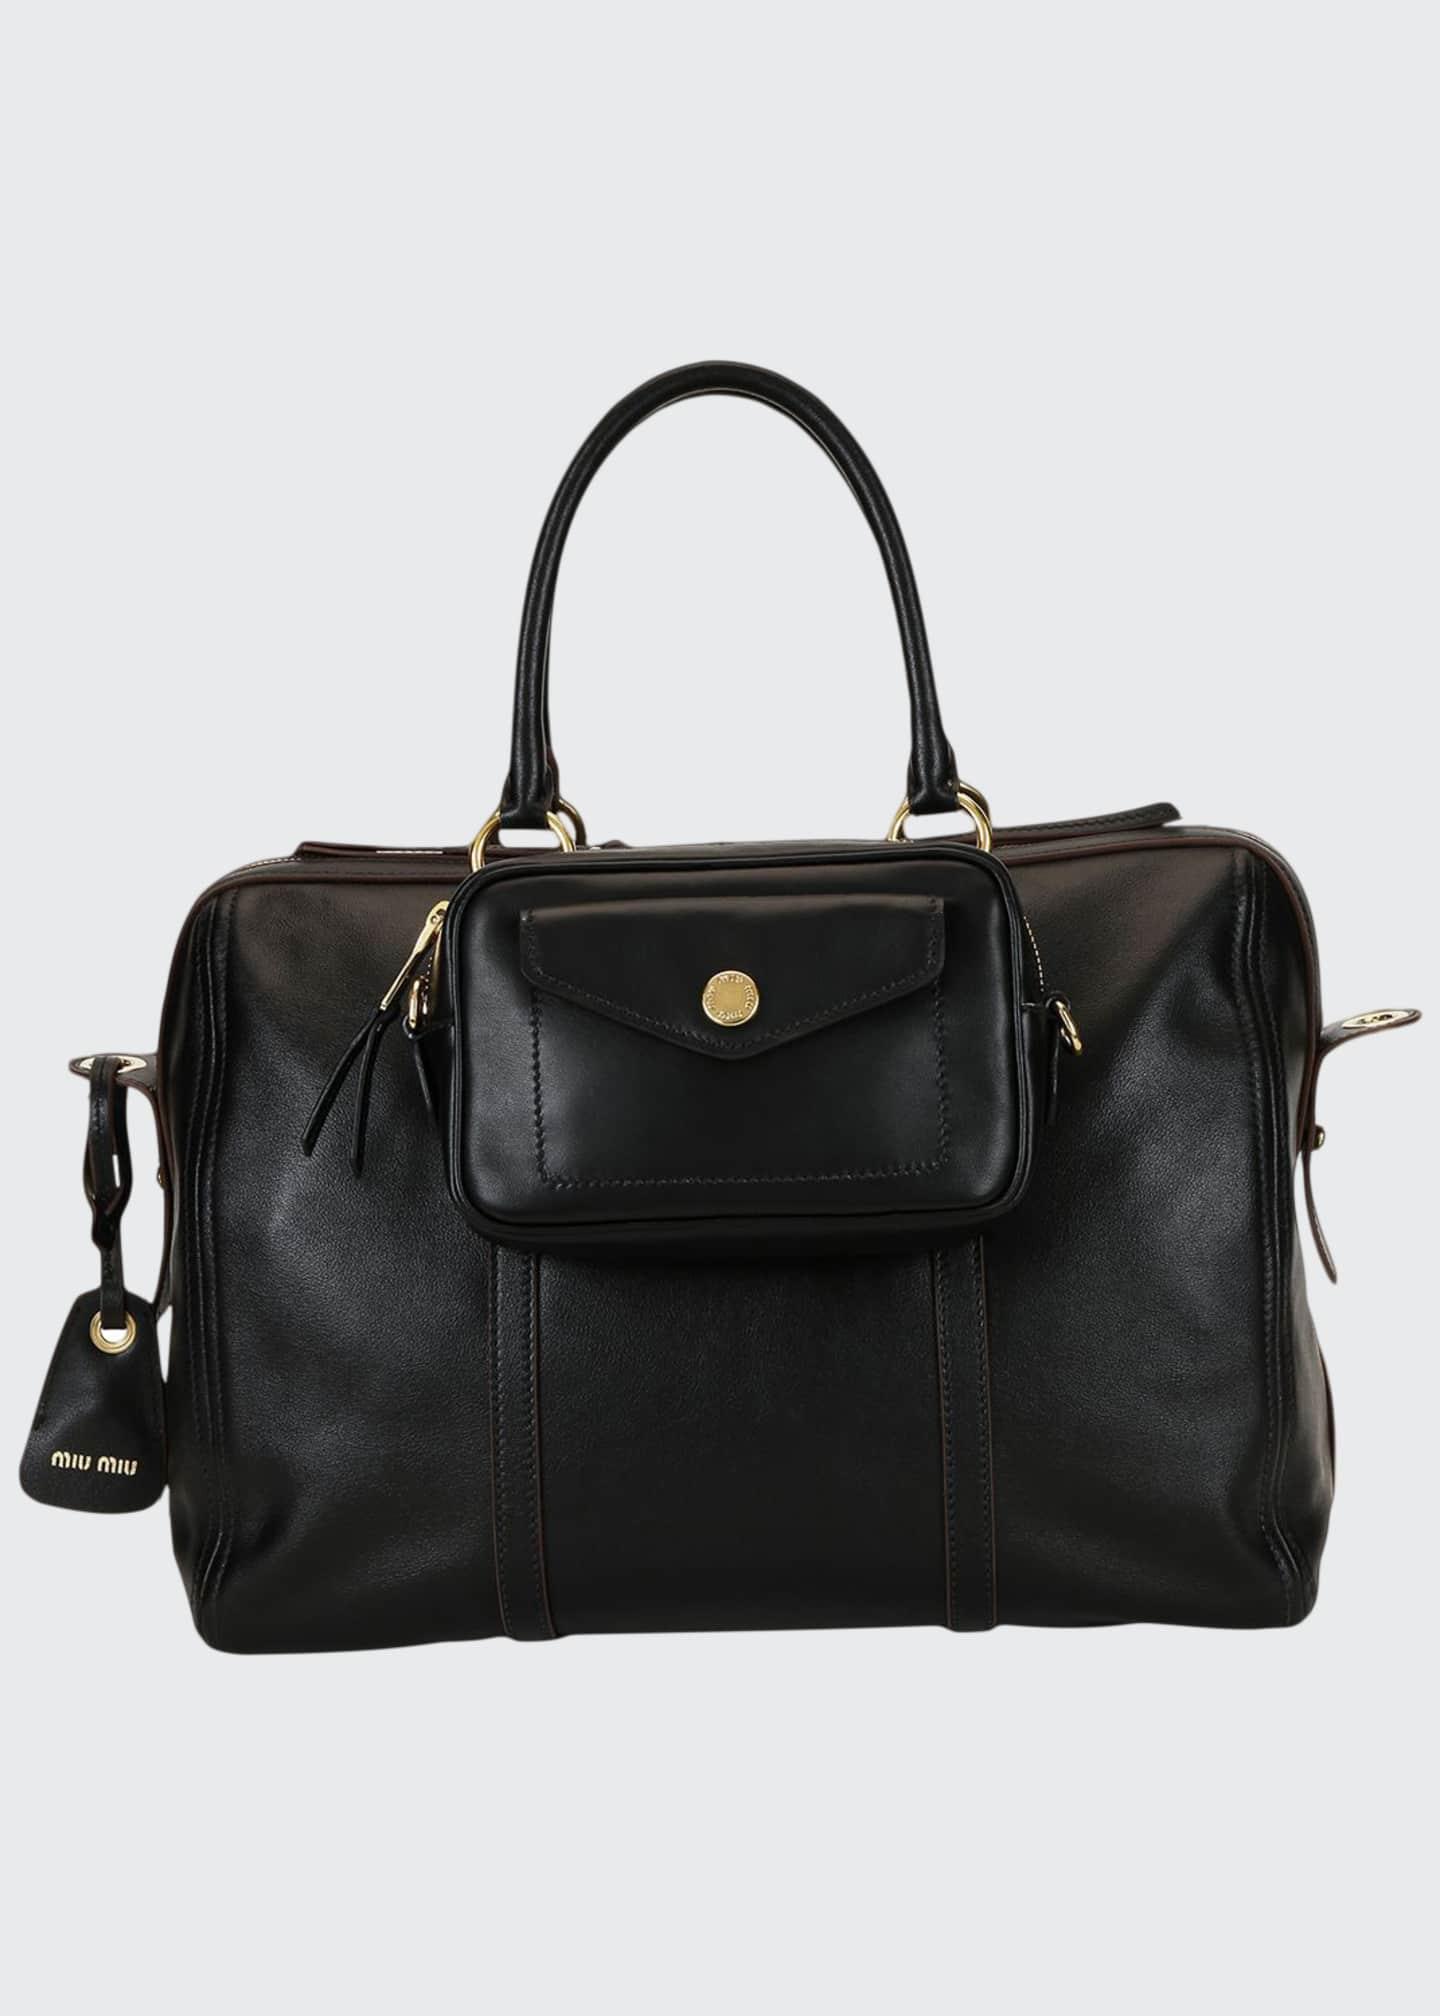 Miu Miu Grace Square Leather Duffle Bag